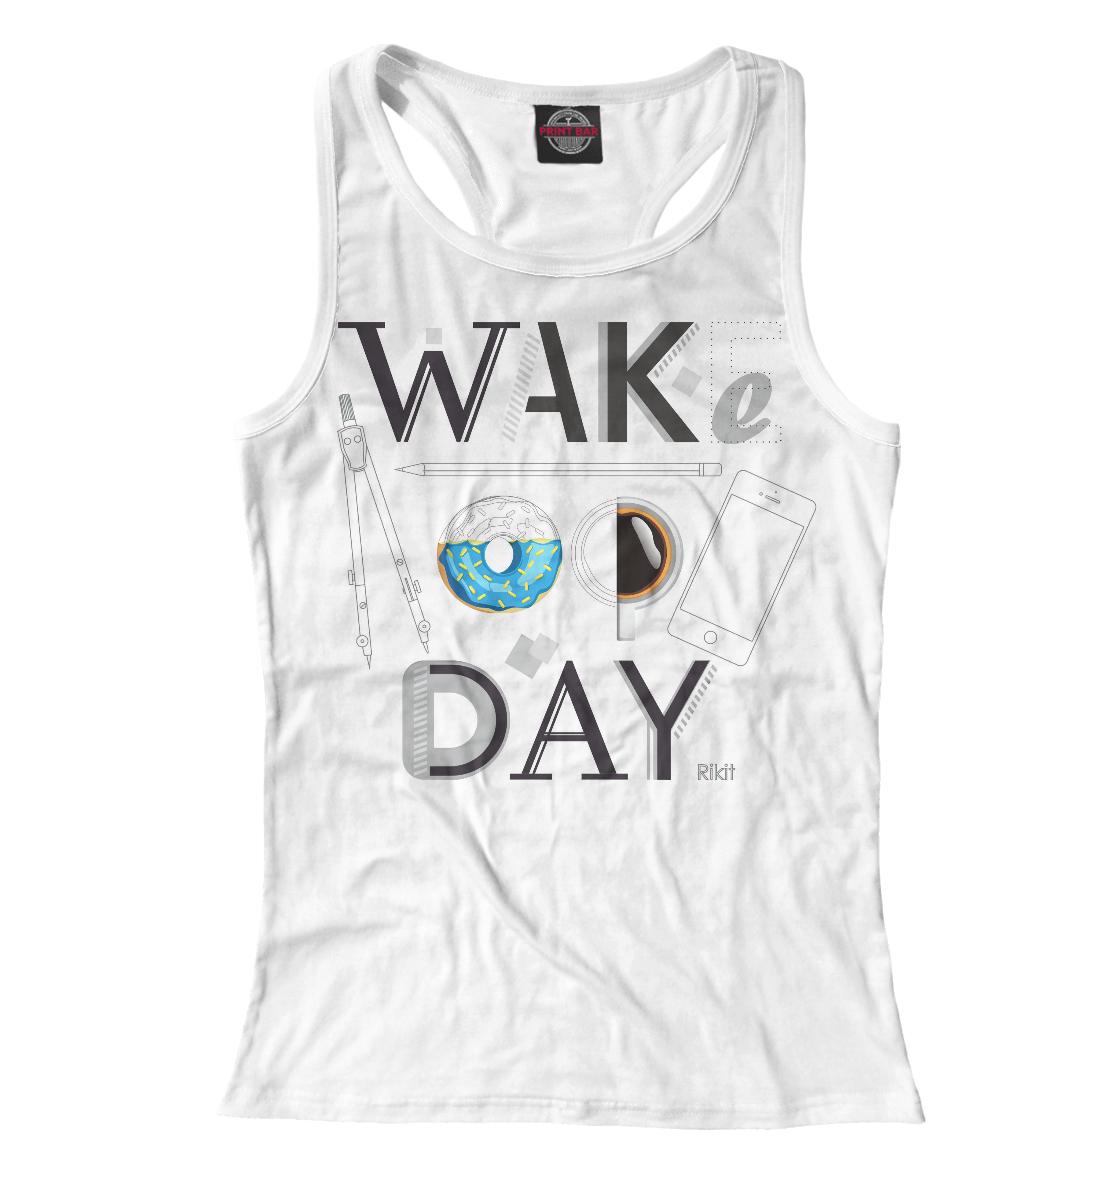 Купить Say wake up day, Printbar, Майки борцовки, DZN-819456-mayb-1